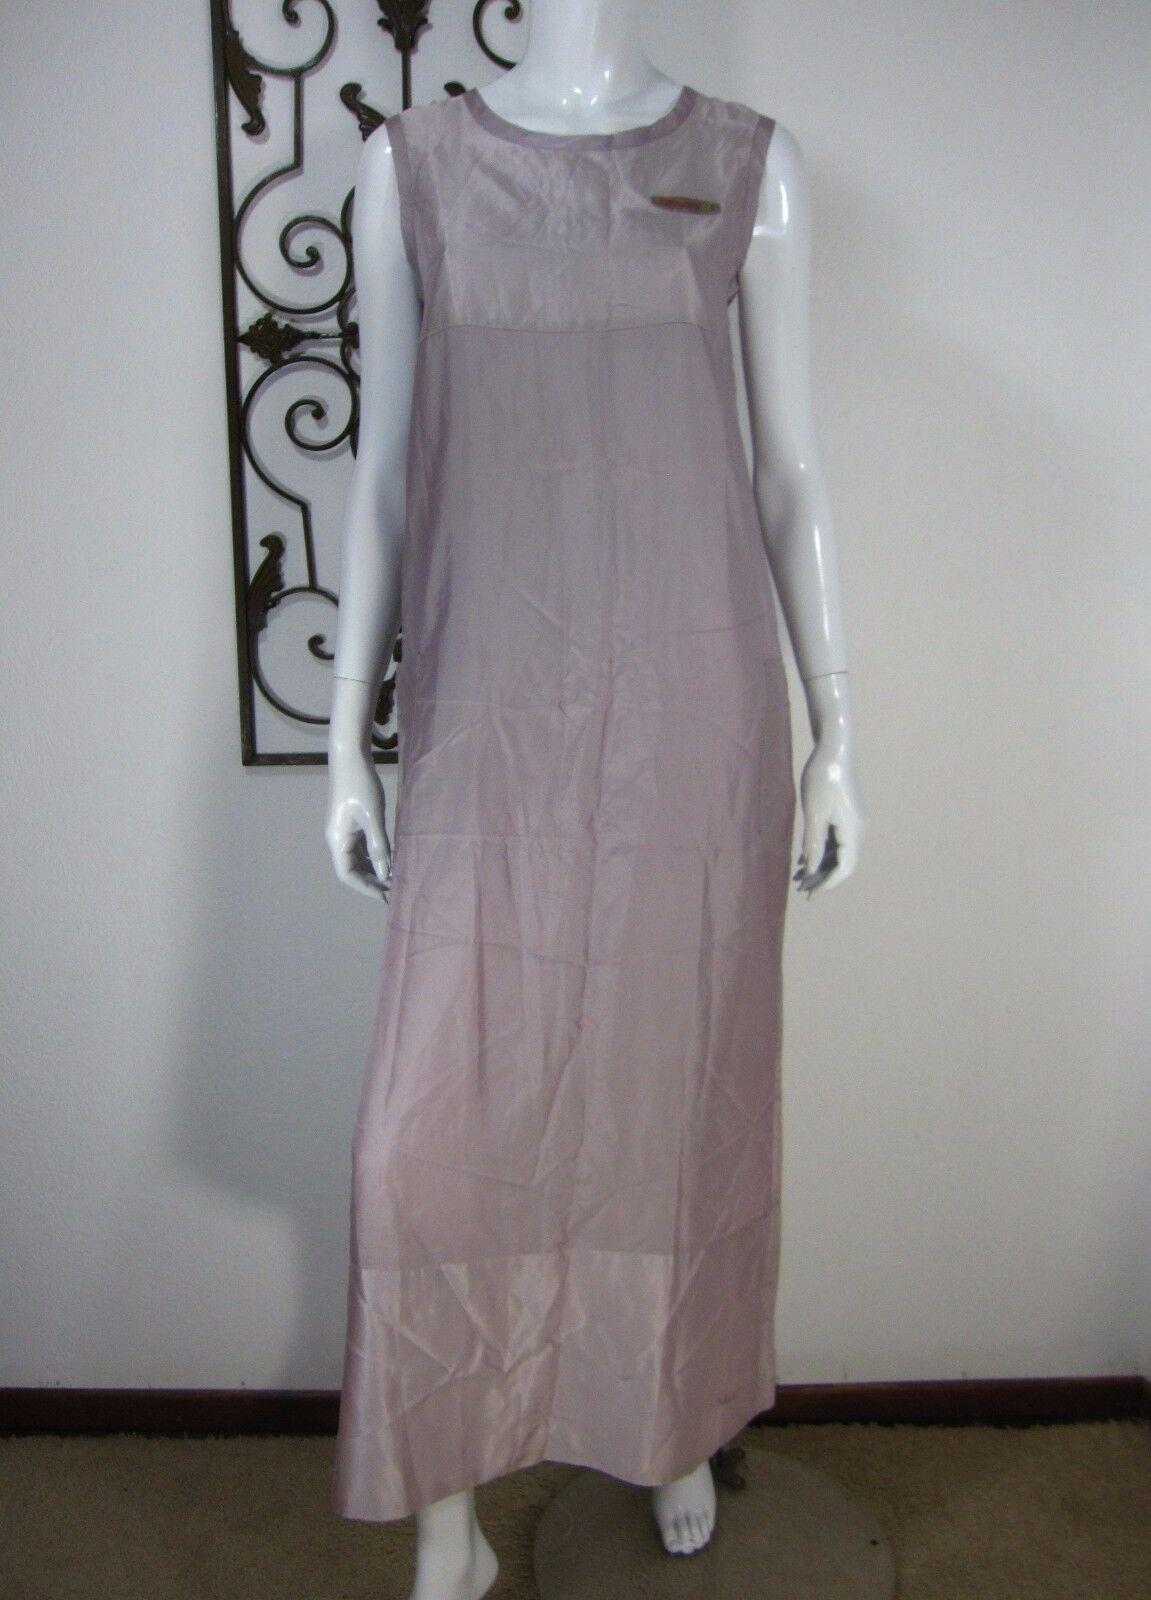 GAVIN NWT SLEEVELESS DRESS SIZE S SMALL DARK pink